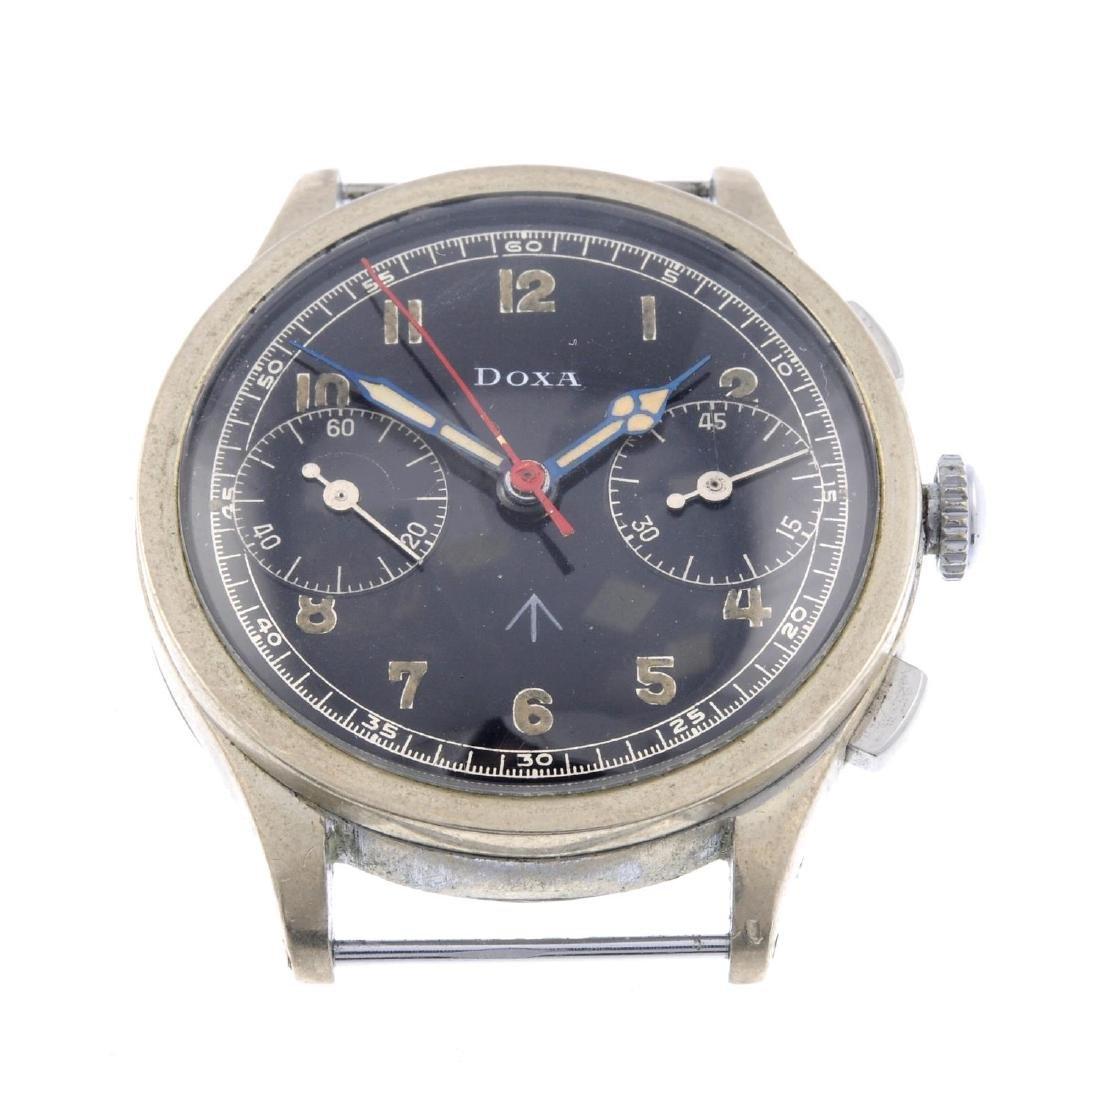 DOXA - a gentleman's chronograph watch head. Nickel